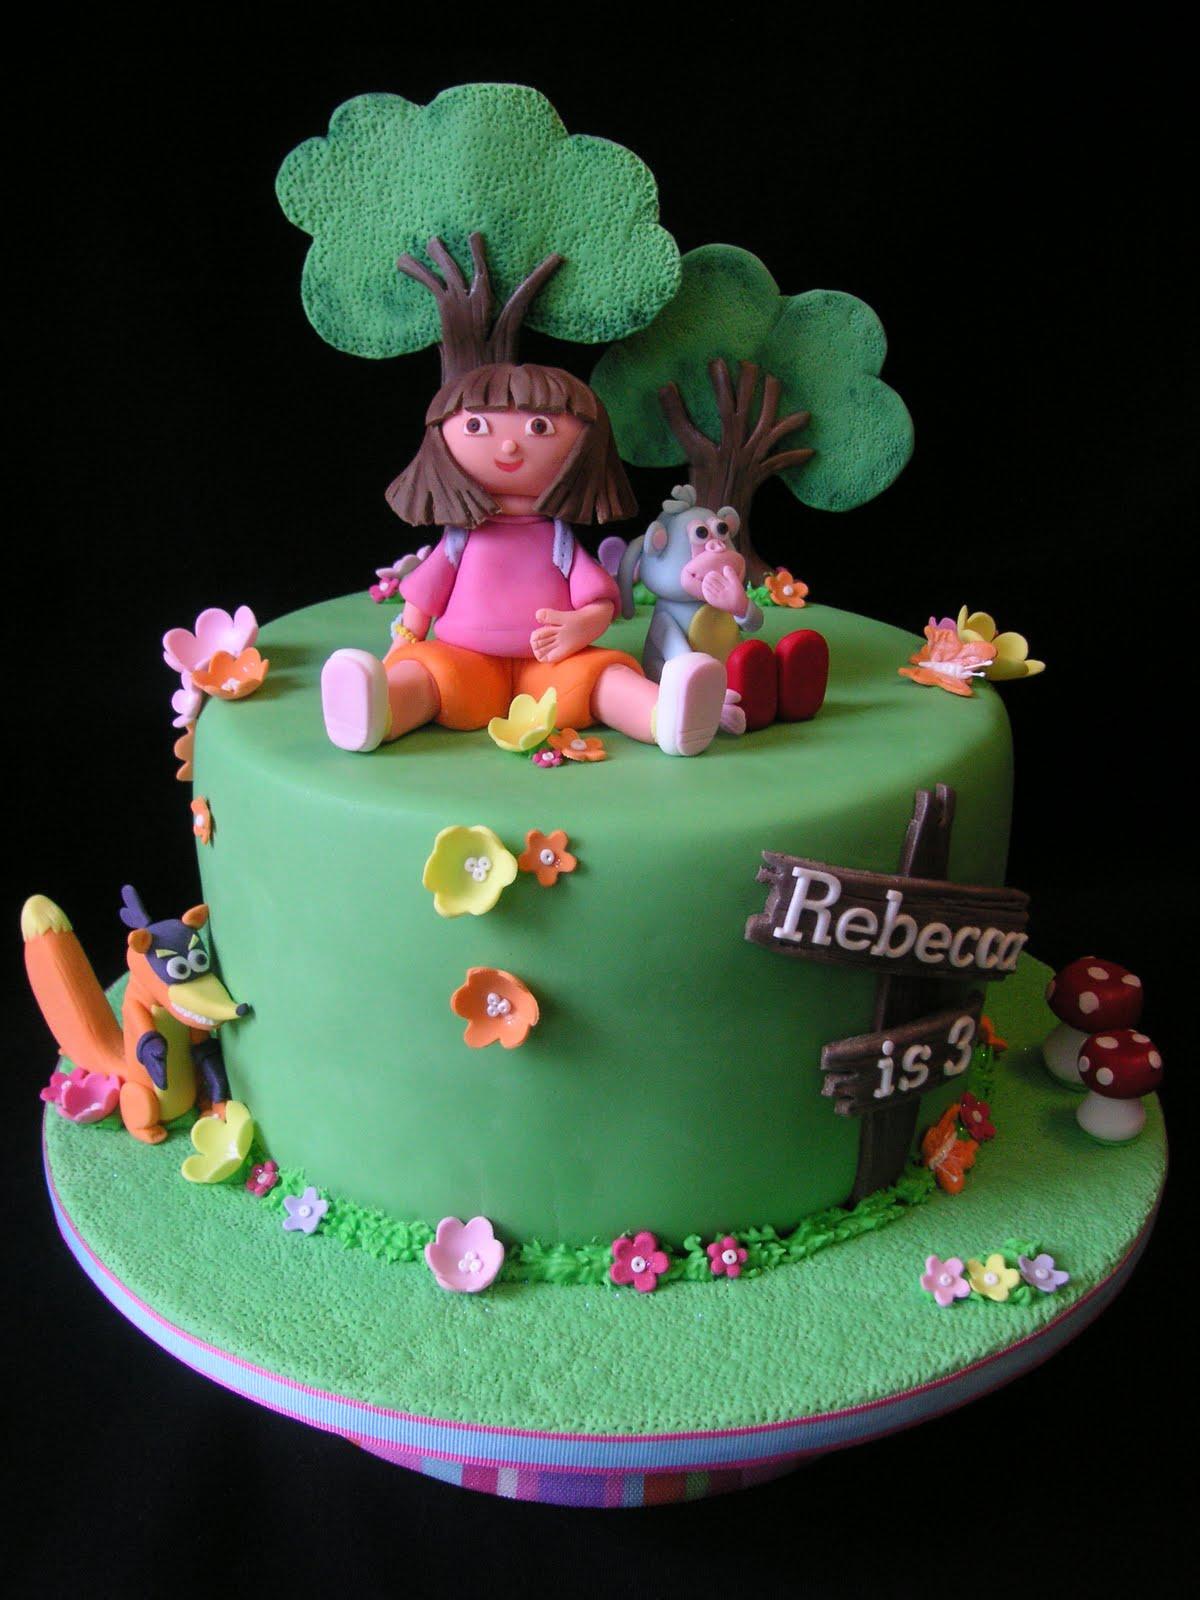 Coolest Cupcakes: Dora birthday cake